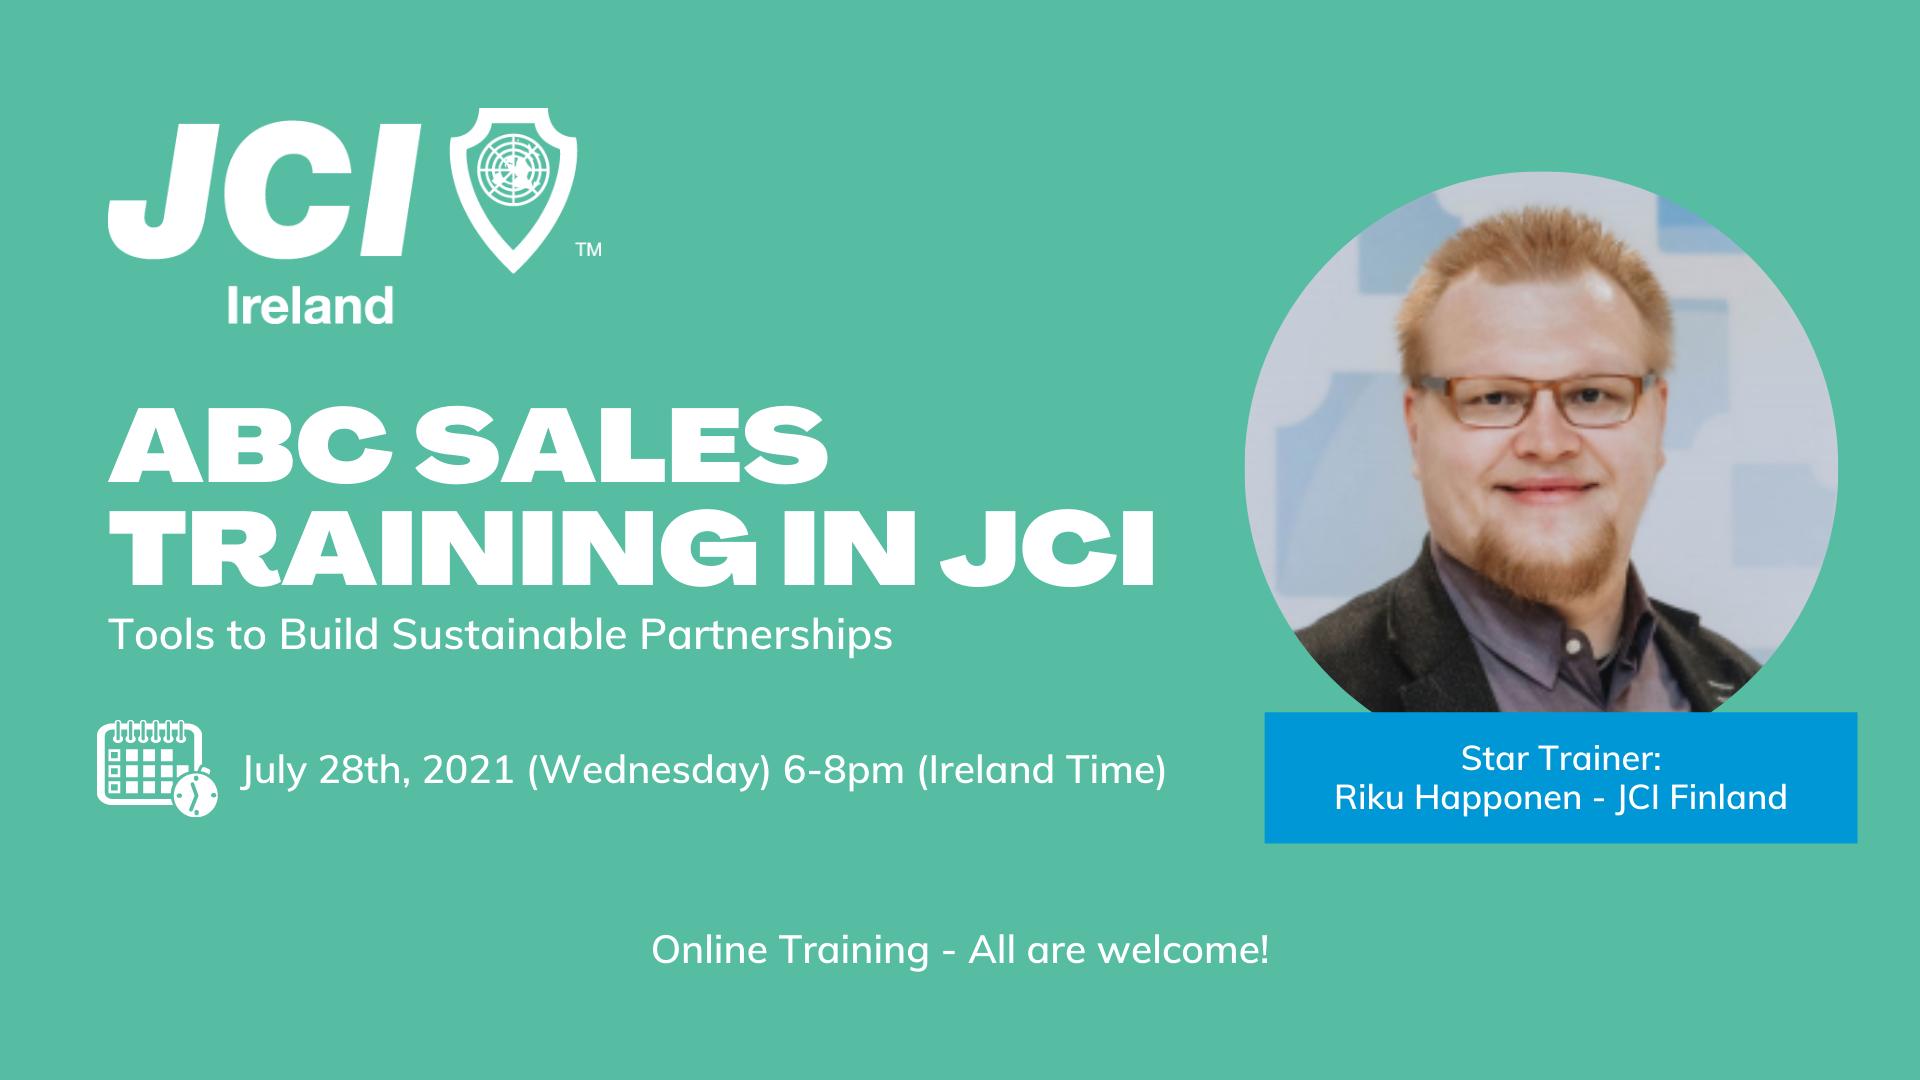 ABC Sales Training in JCI